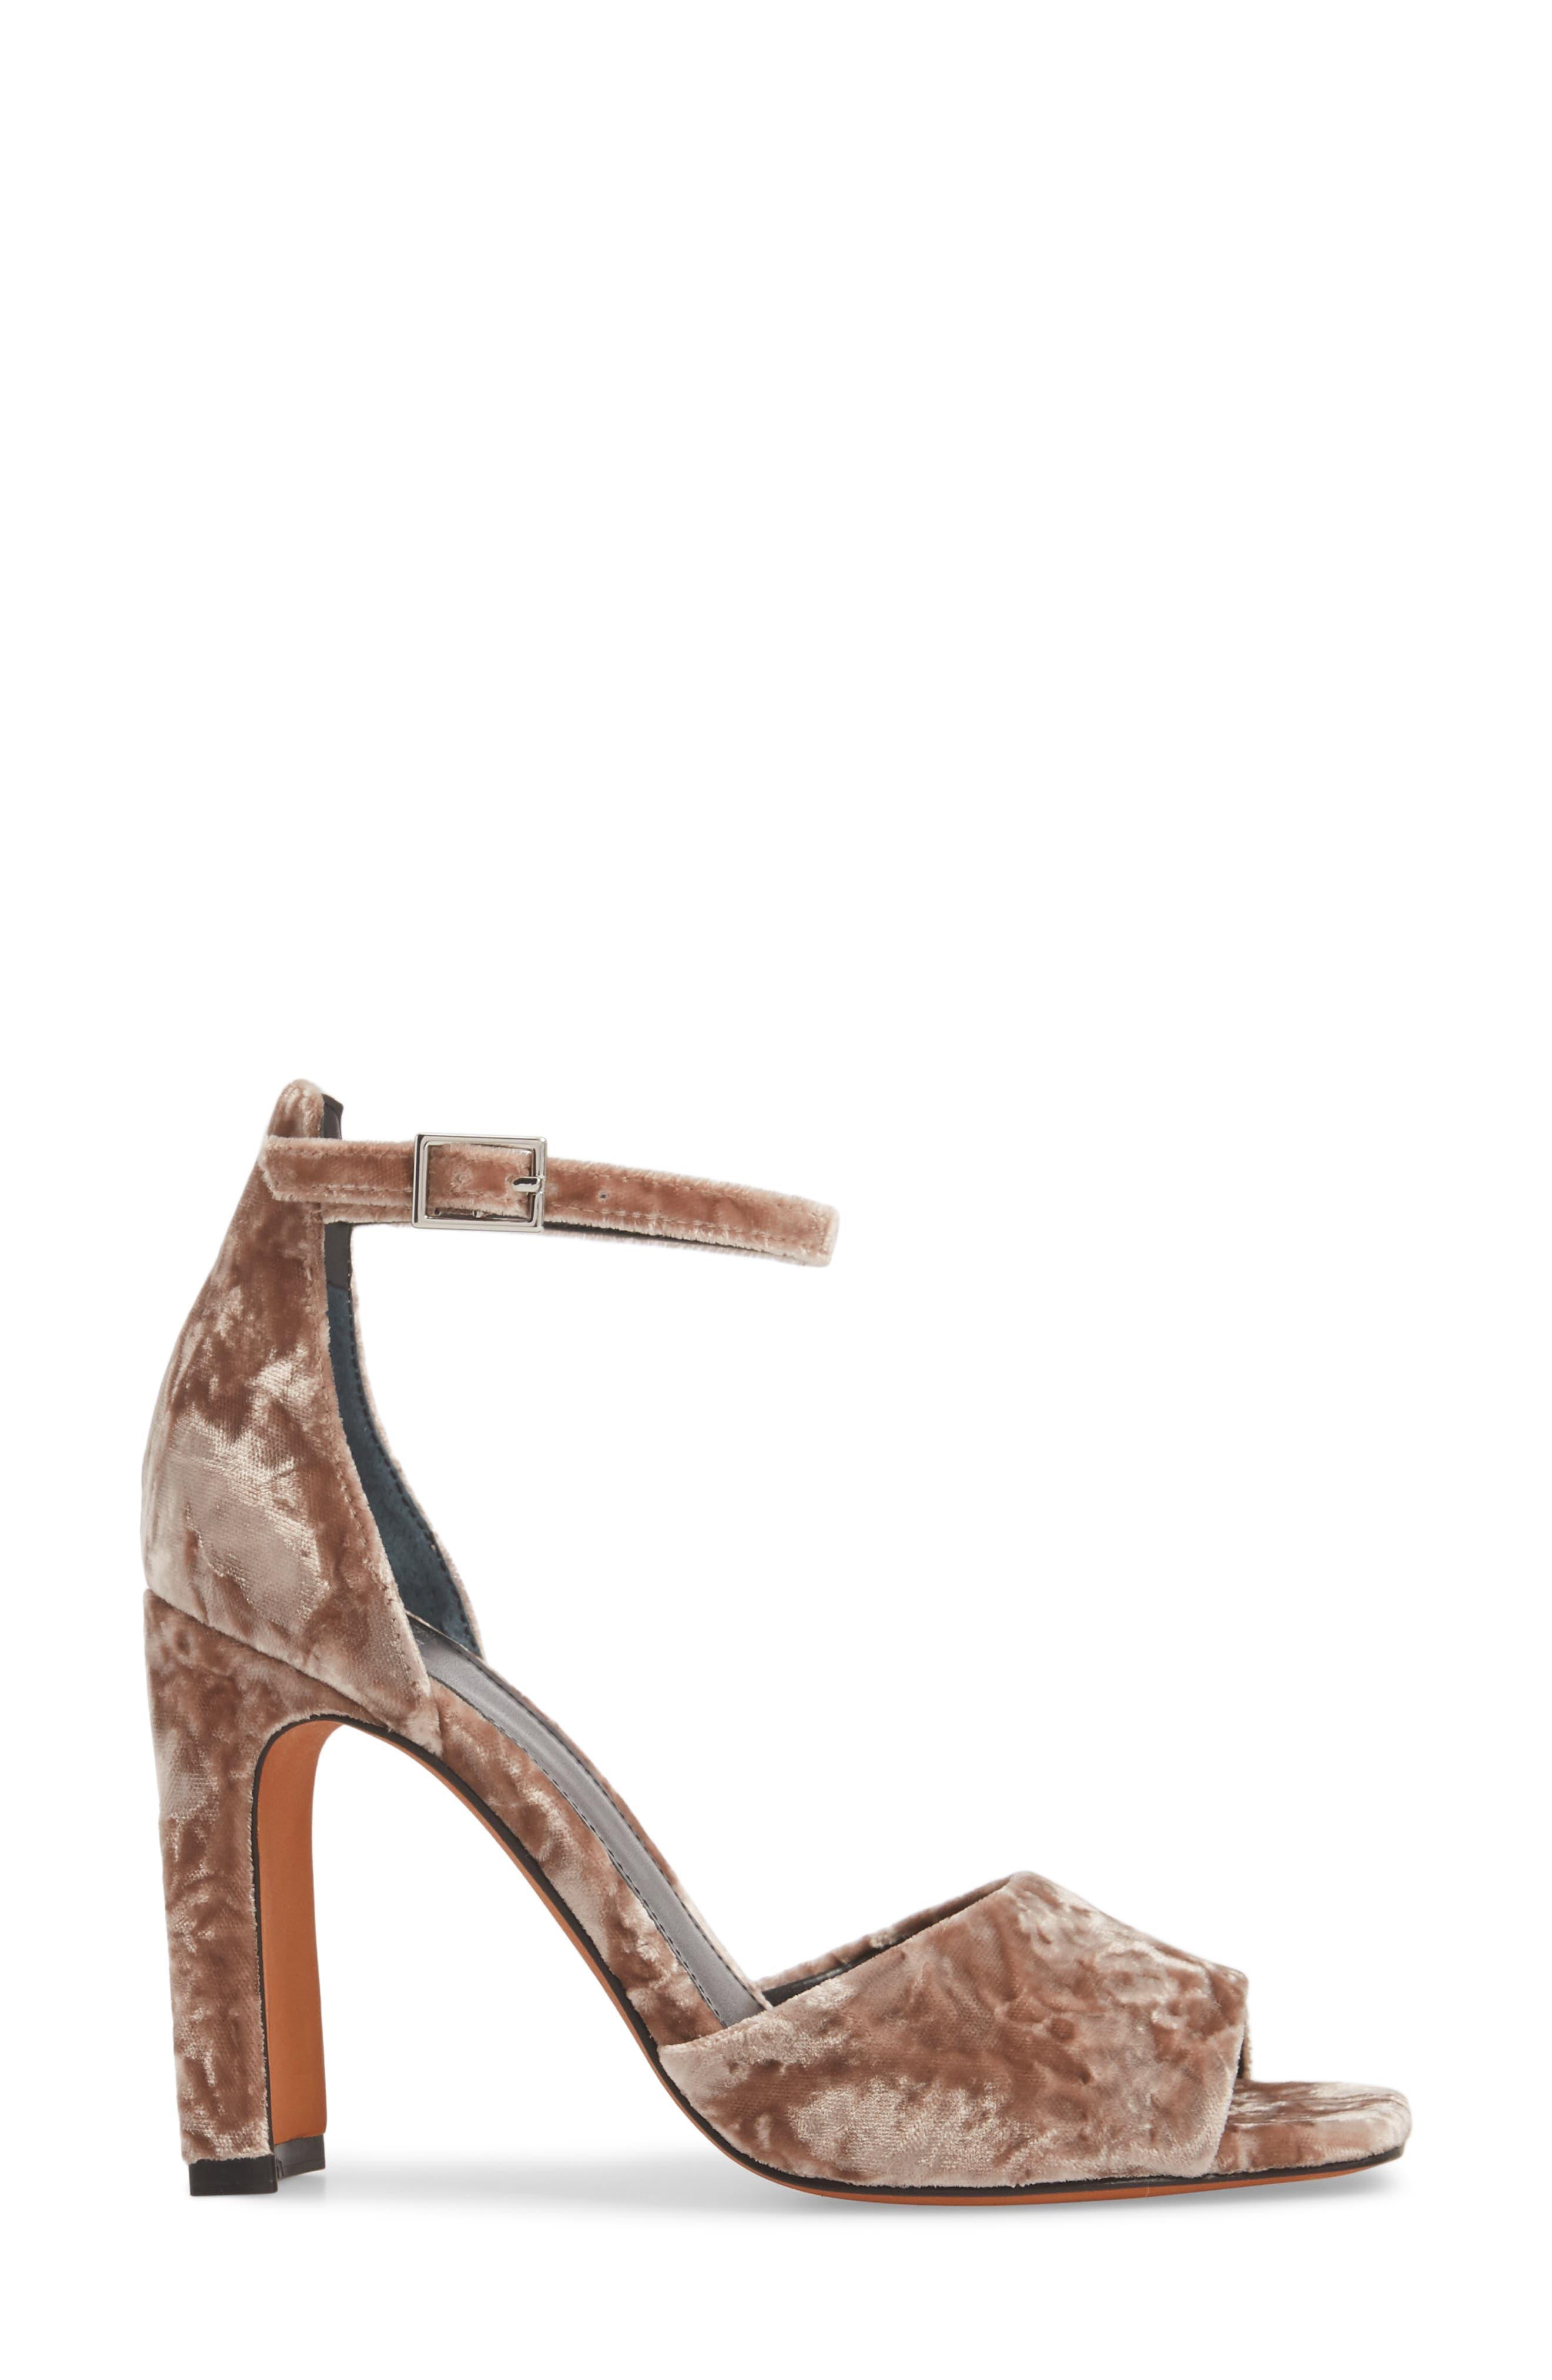 Harlin Ankle Strap Sandal,                             Alternate thumbnail 6, color,                             Light Pink Fabric